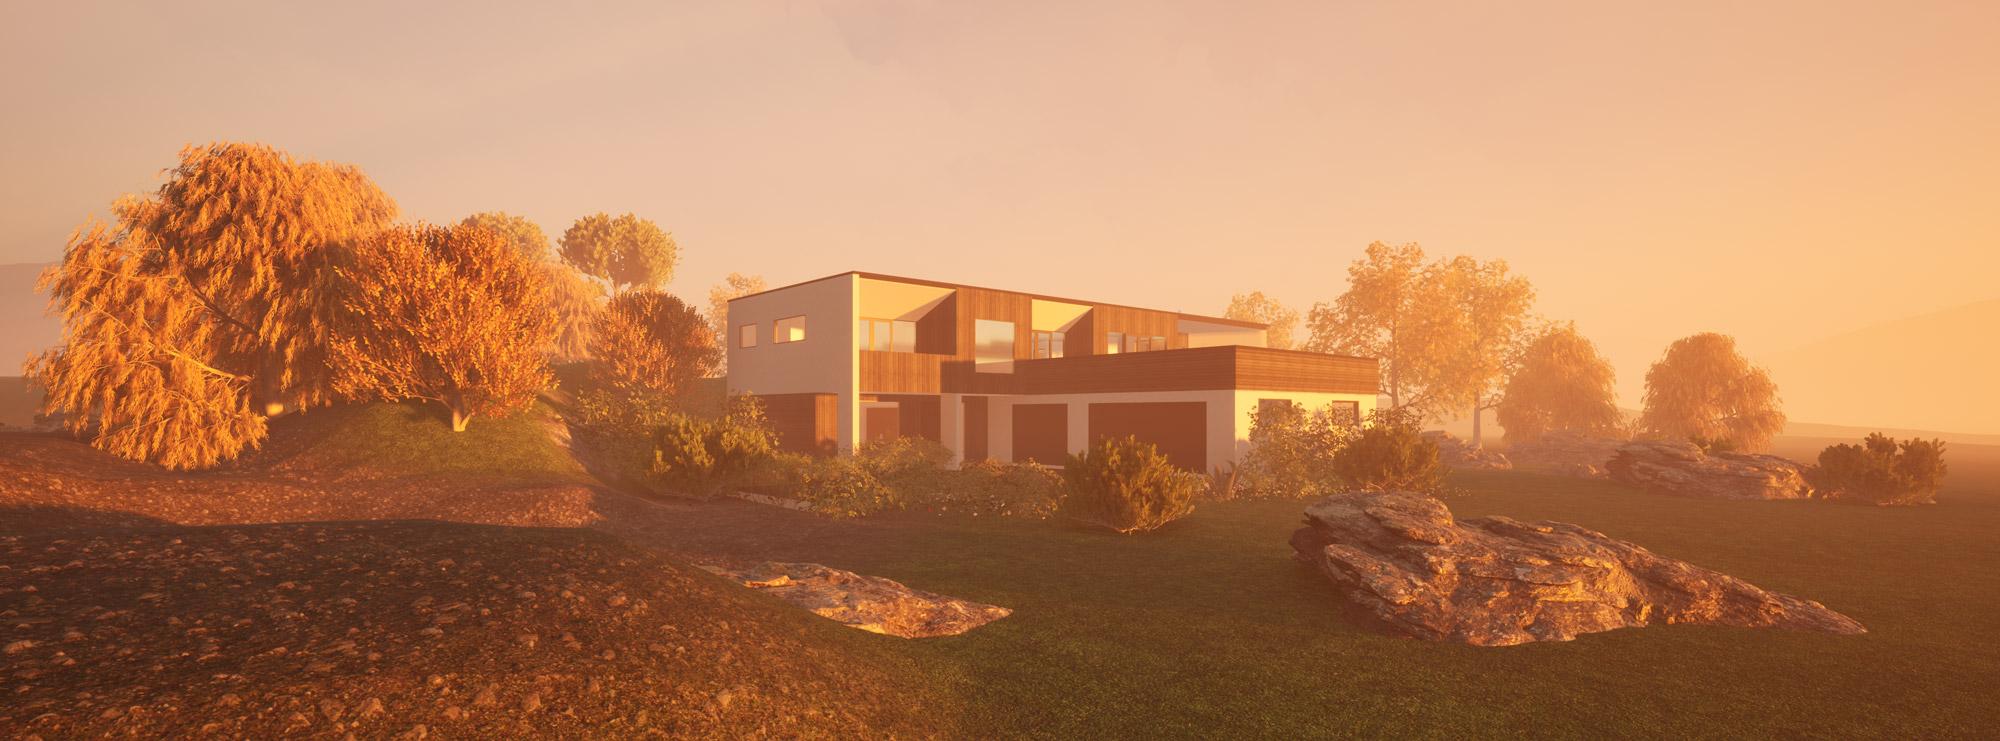 Heathfield, Dunedin view 4 by Architecture Design Studio